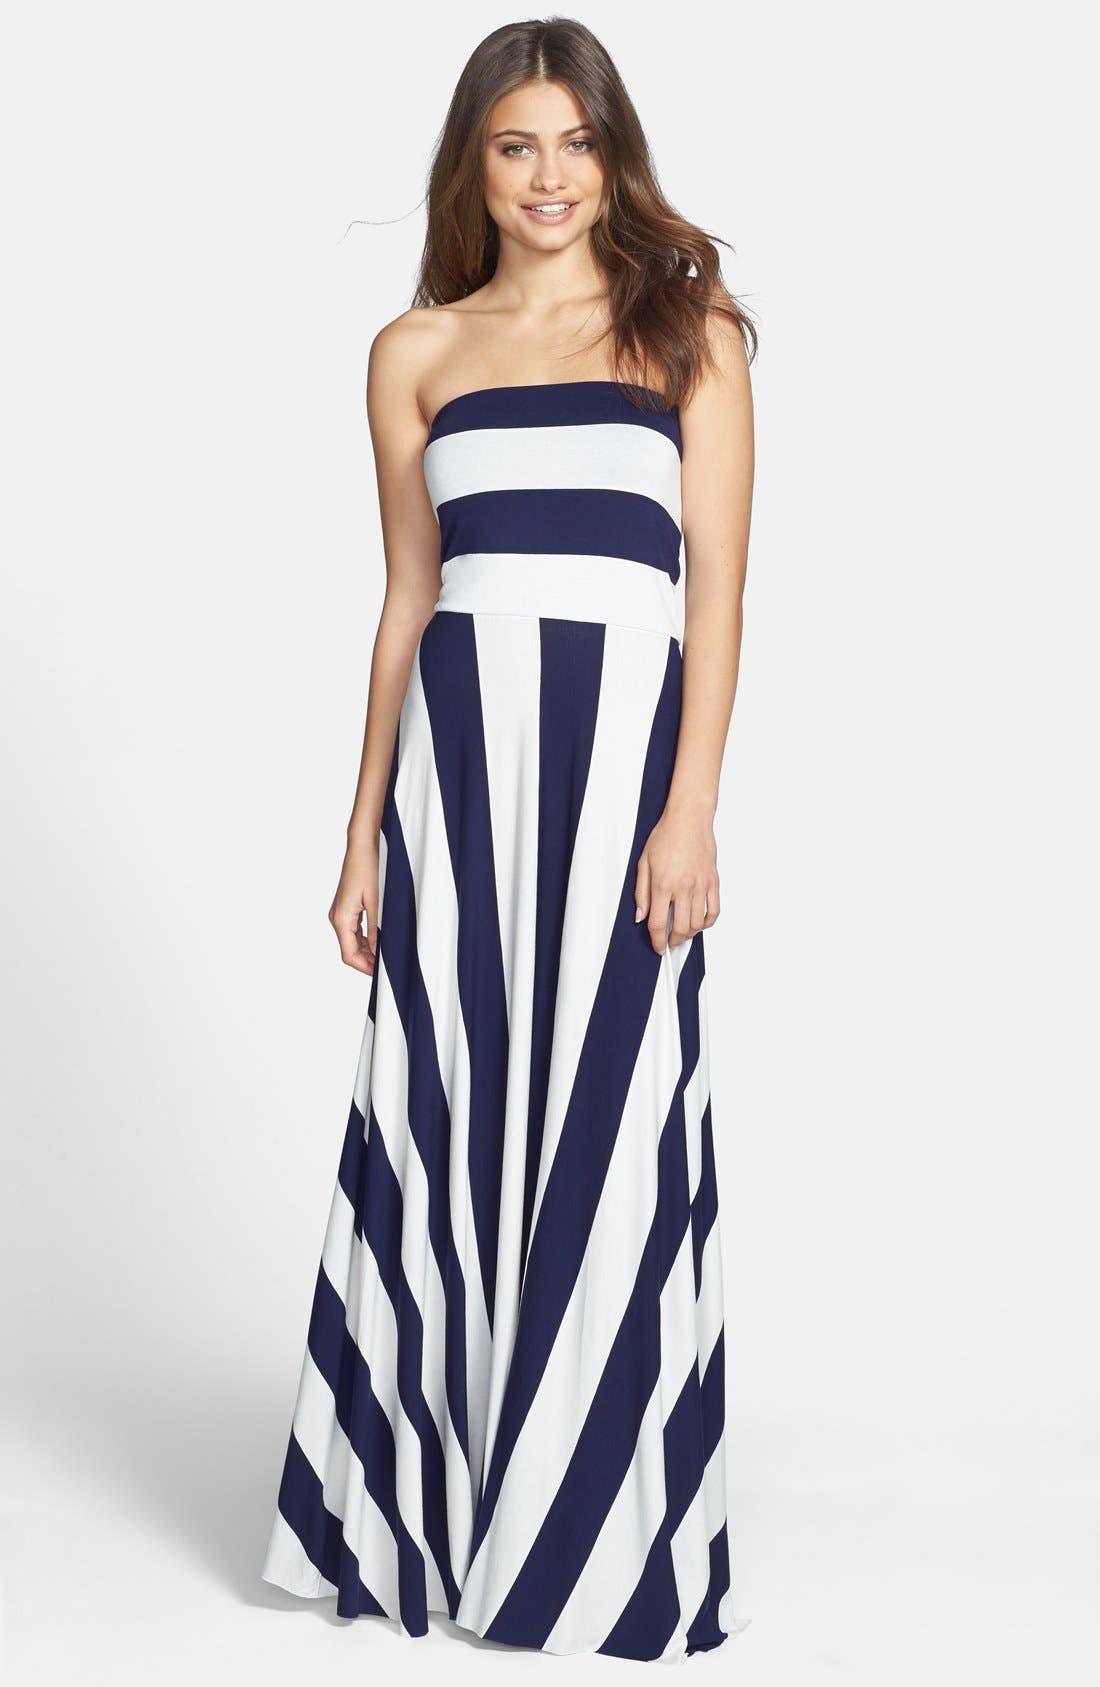 Main Image - Elan Stripe Convertible Bias Cut Cover-Up Maxi Dress